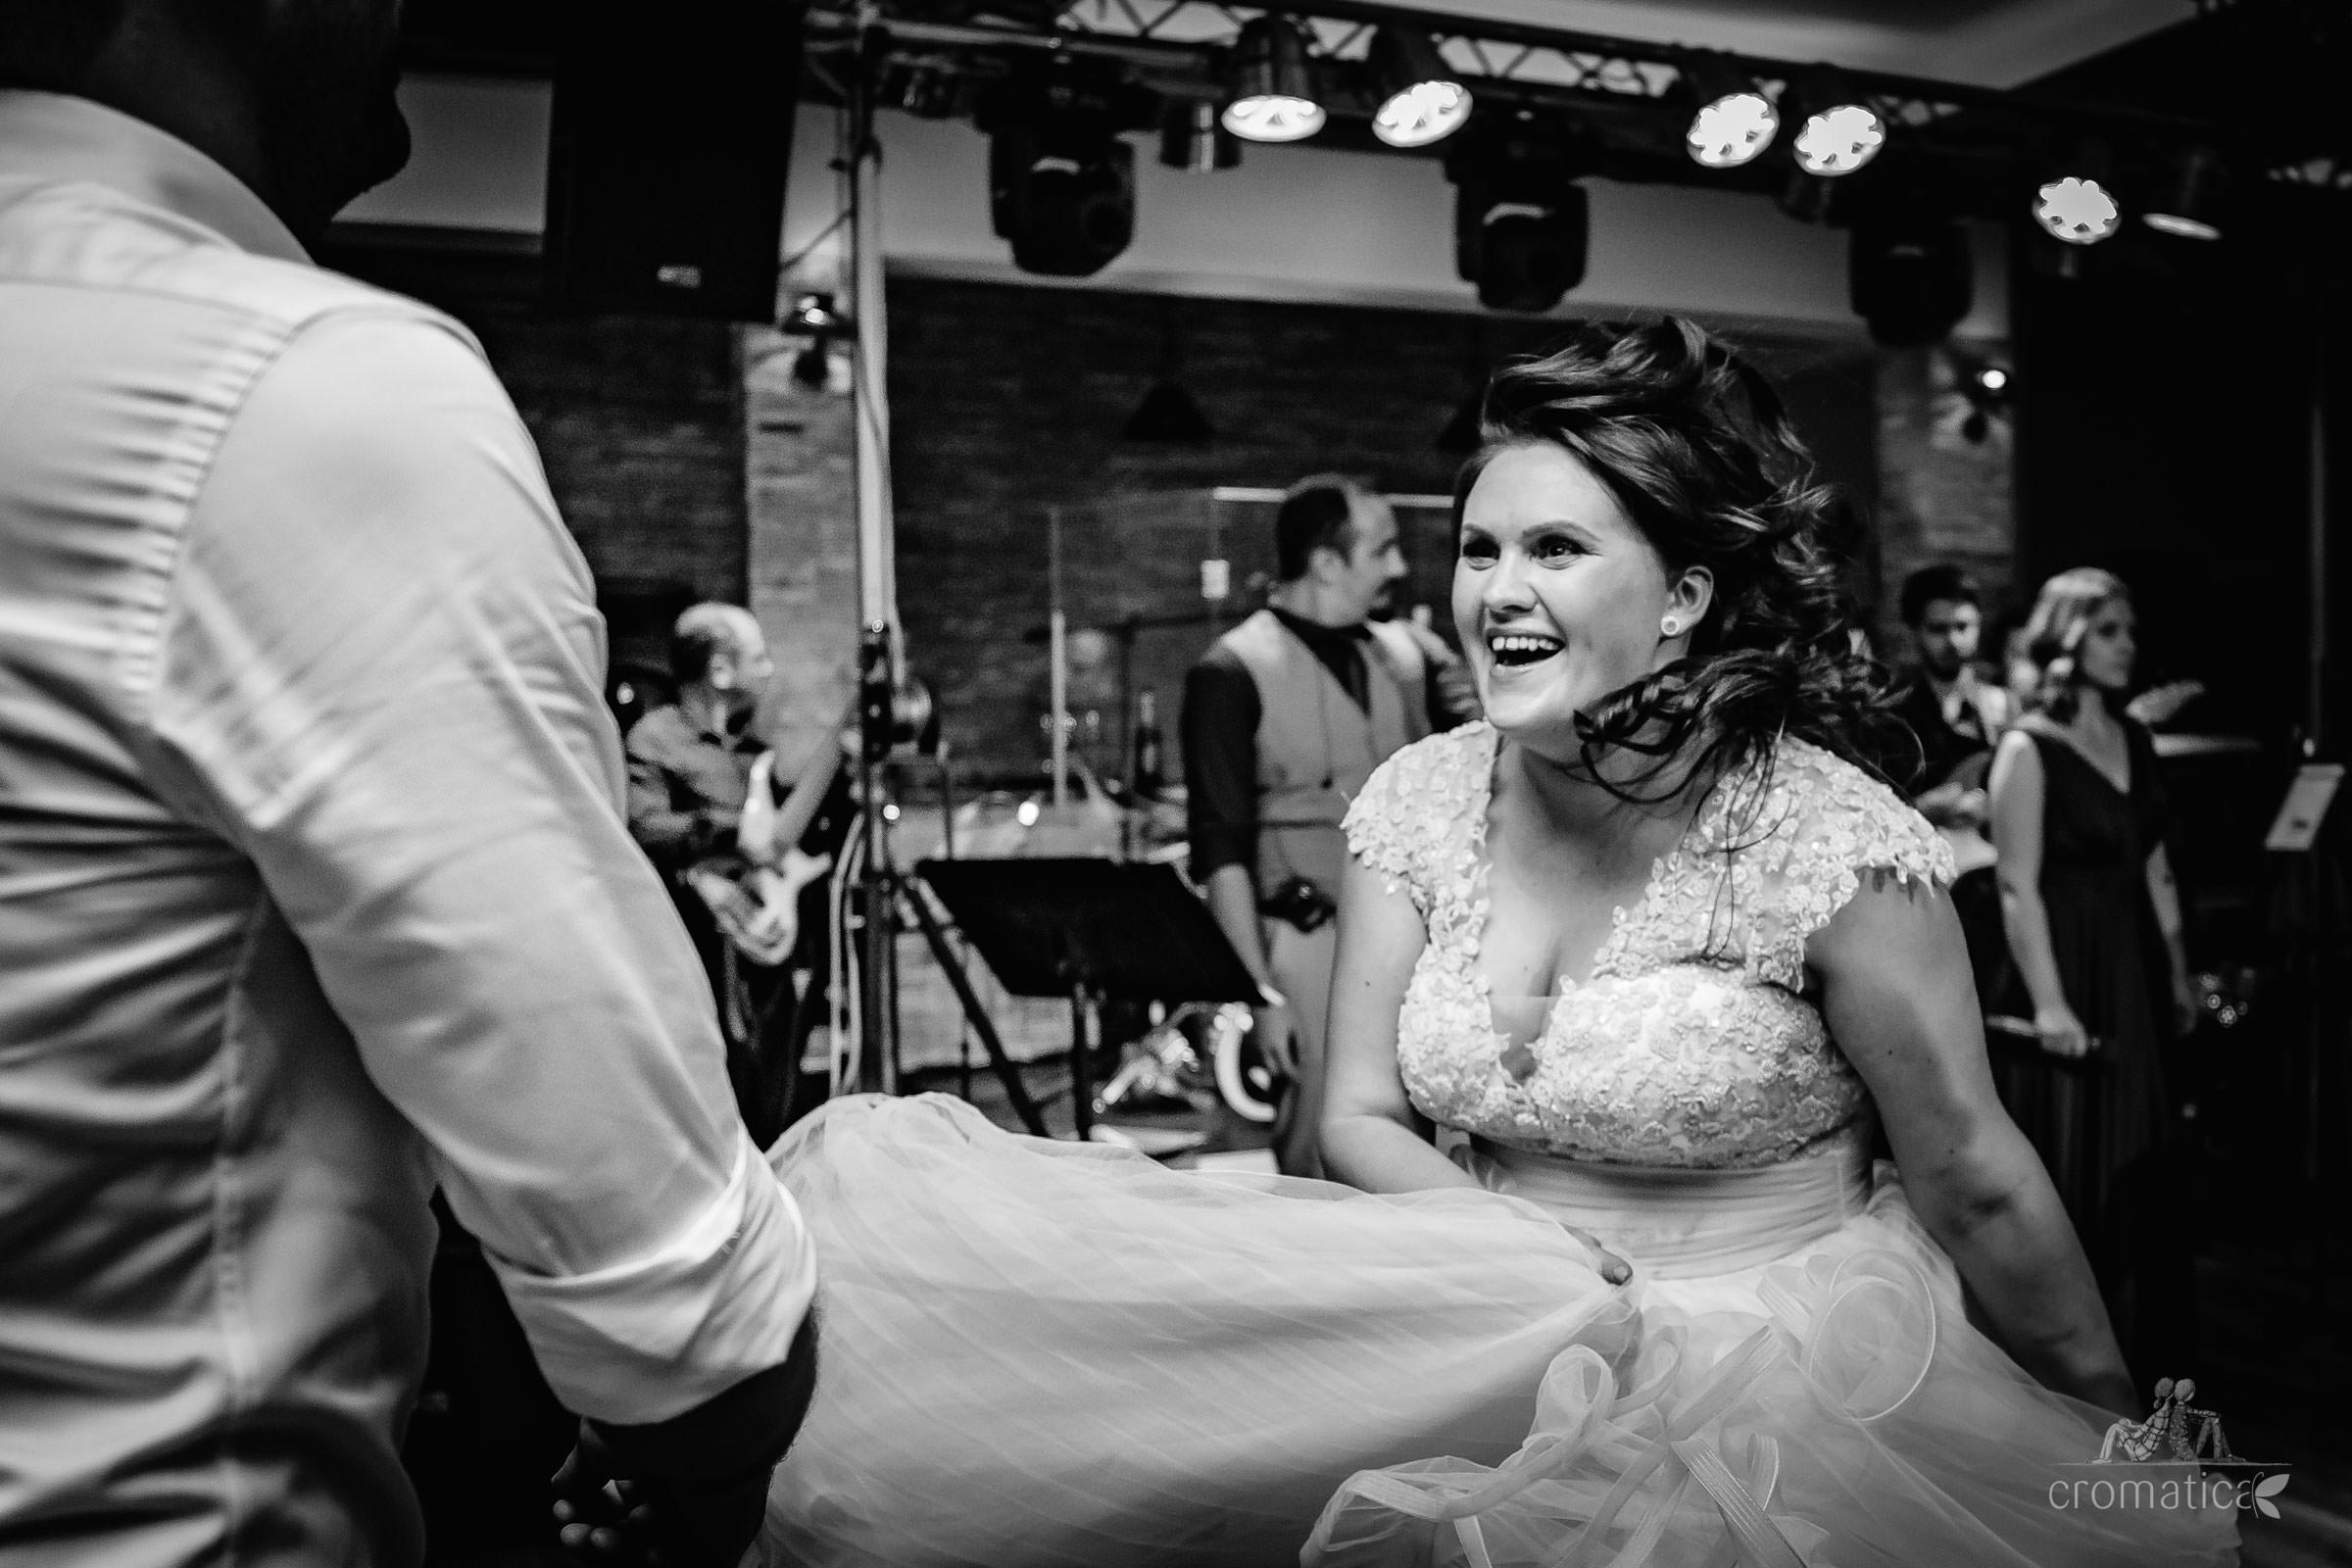 giorgiana constantin fotografii nunta delta royal delta dunarii 068